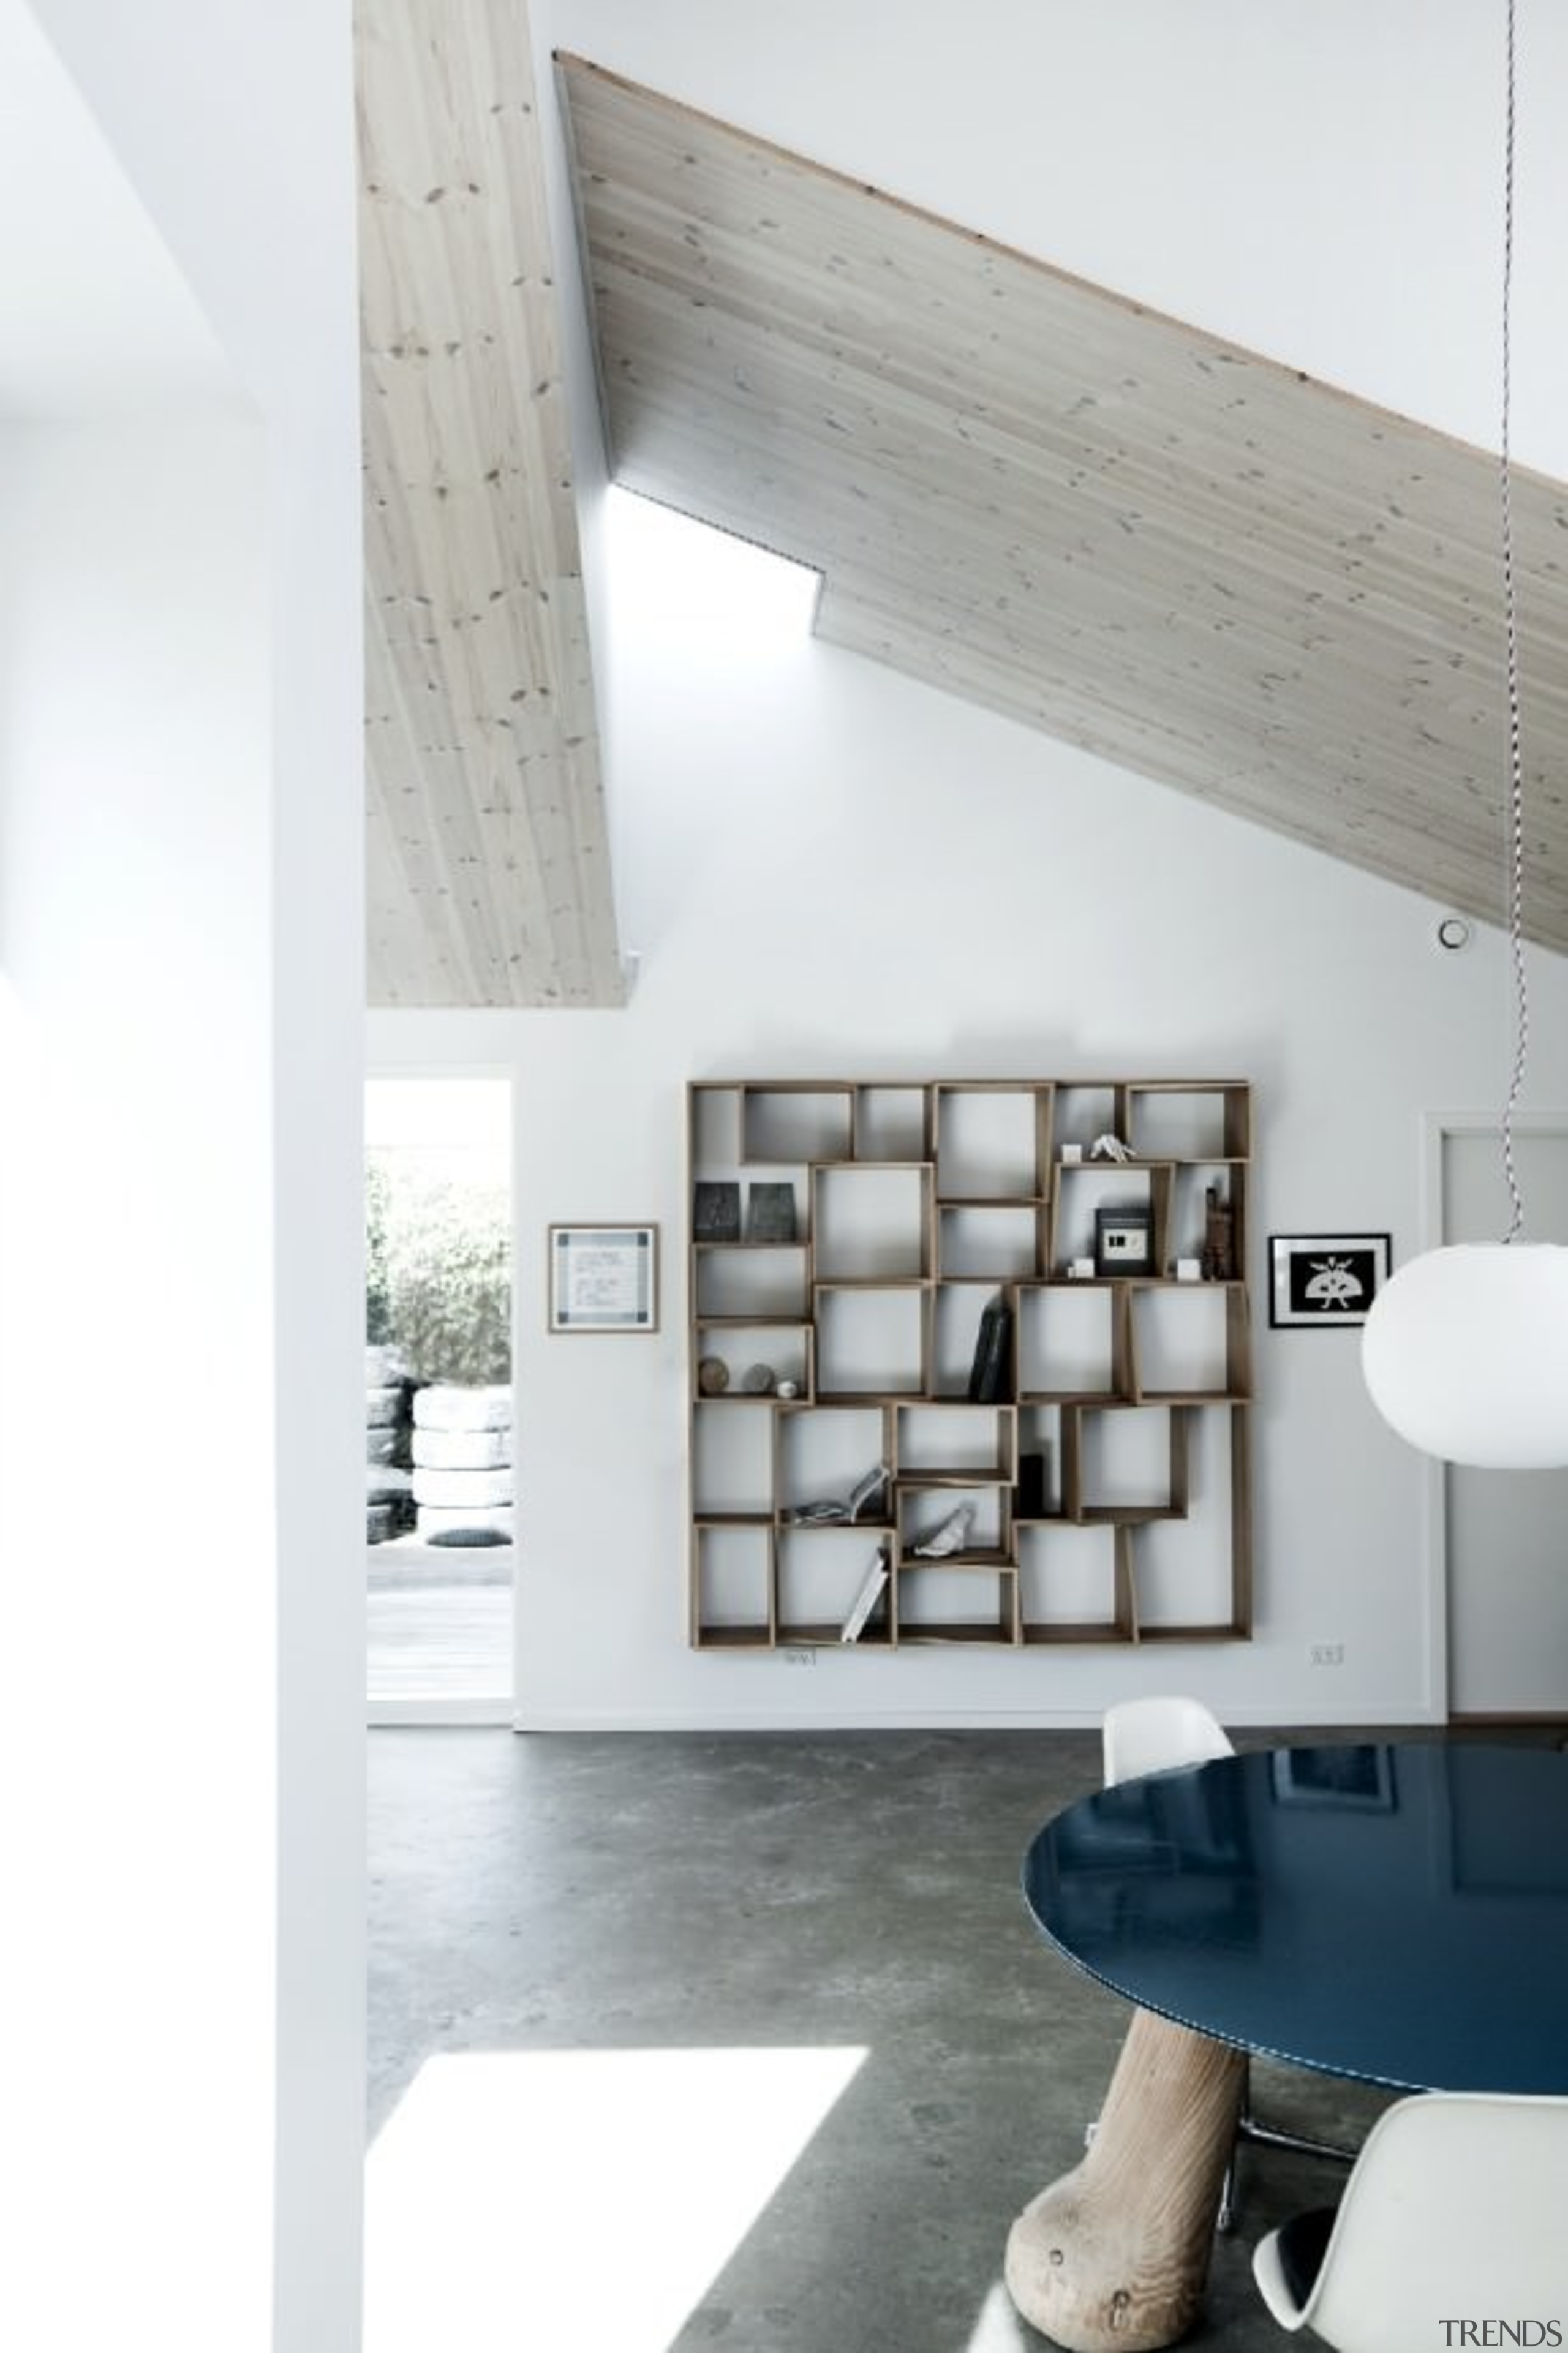 Architect: Sigured LarsenPhotography by Tia Borgsmidt architecture, ceiling, daylighting, floor, furniture, house, interior design, loft, product design, shelf, shelving, wall, white, gray